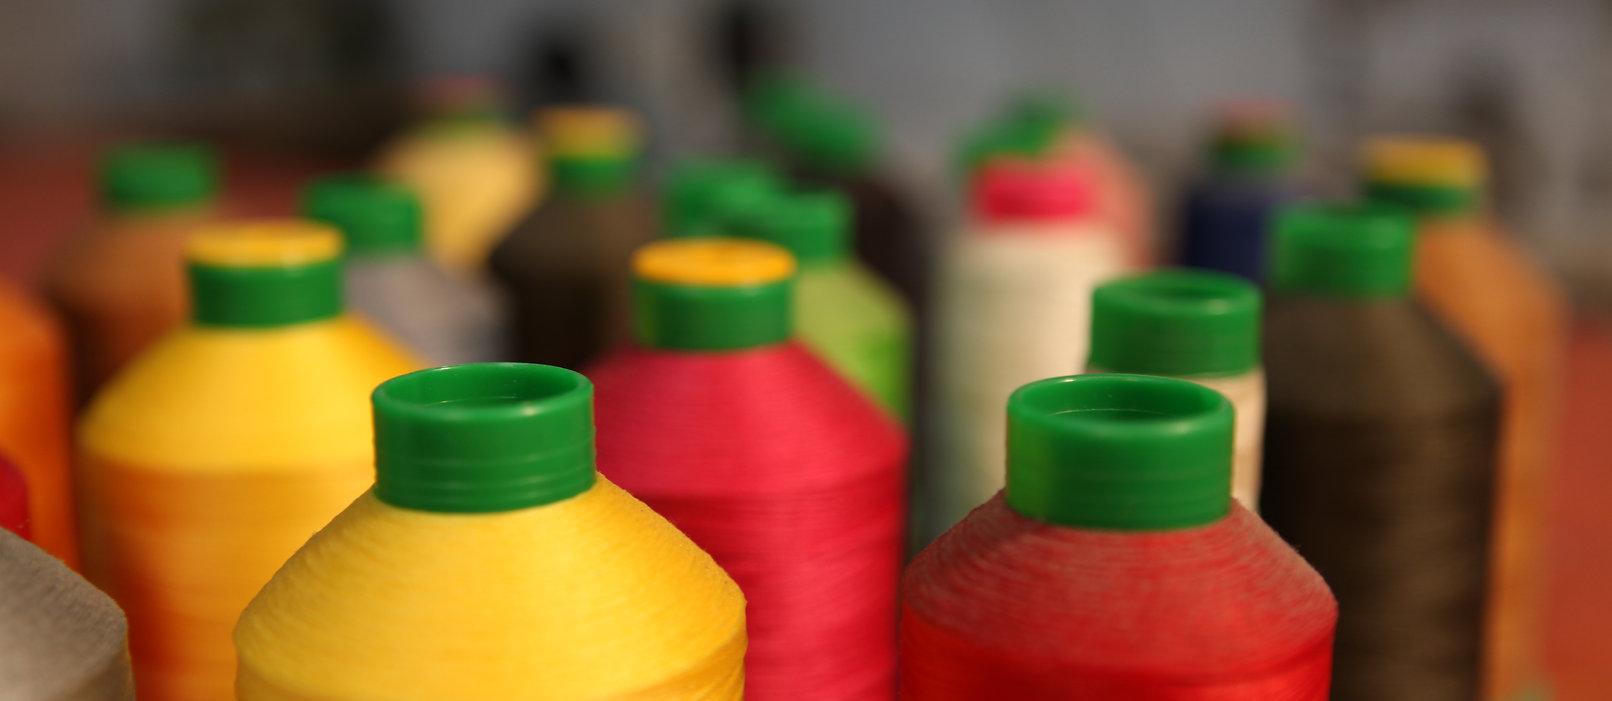 soft goods products  design helek studio